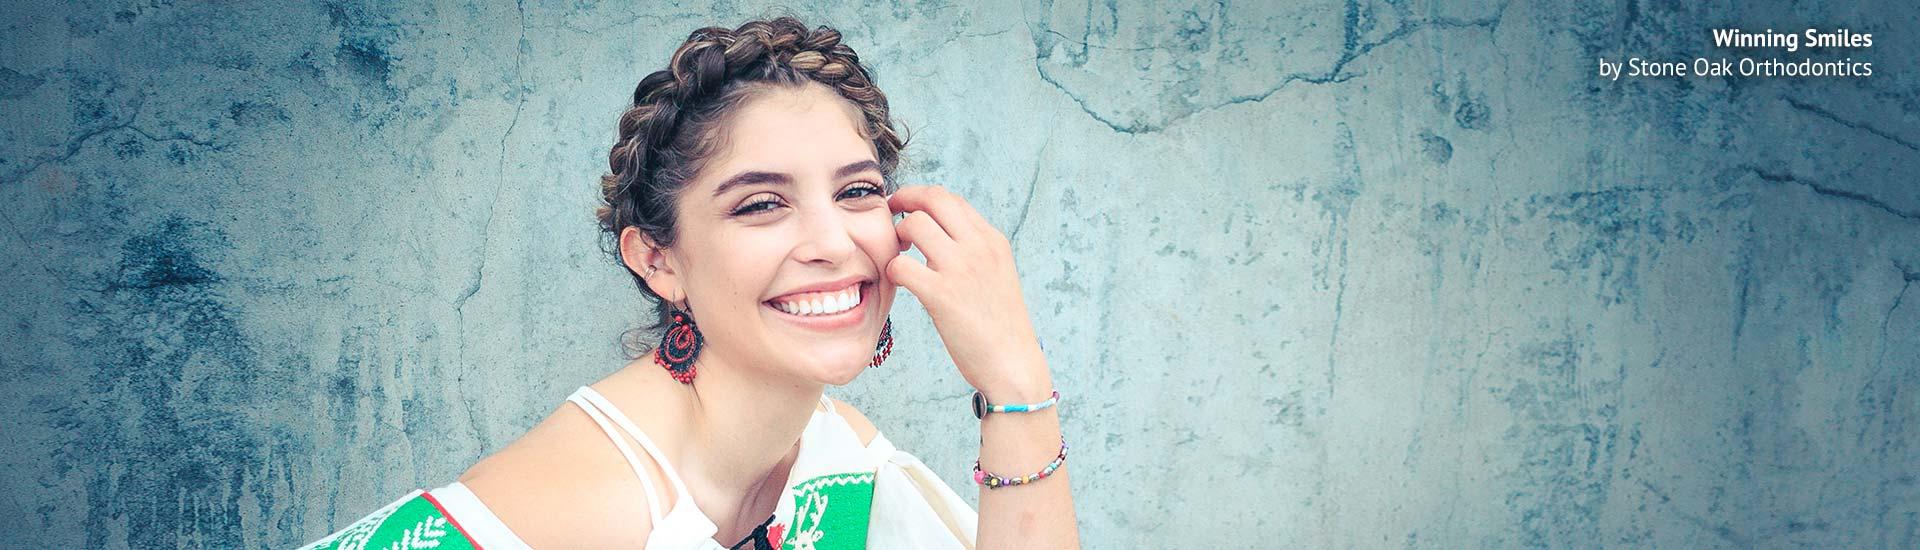 Rebecca Stone Oak Orthodontics San Antonio TX